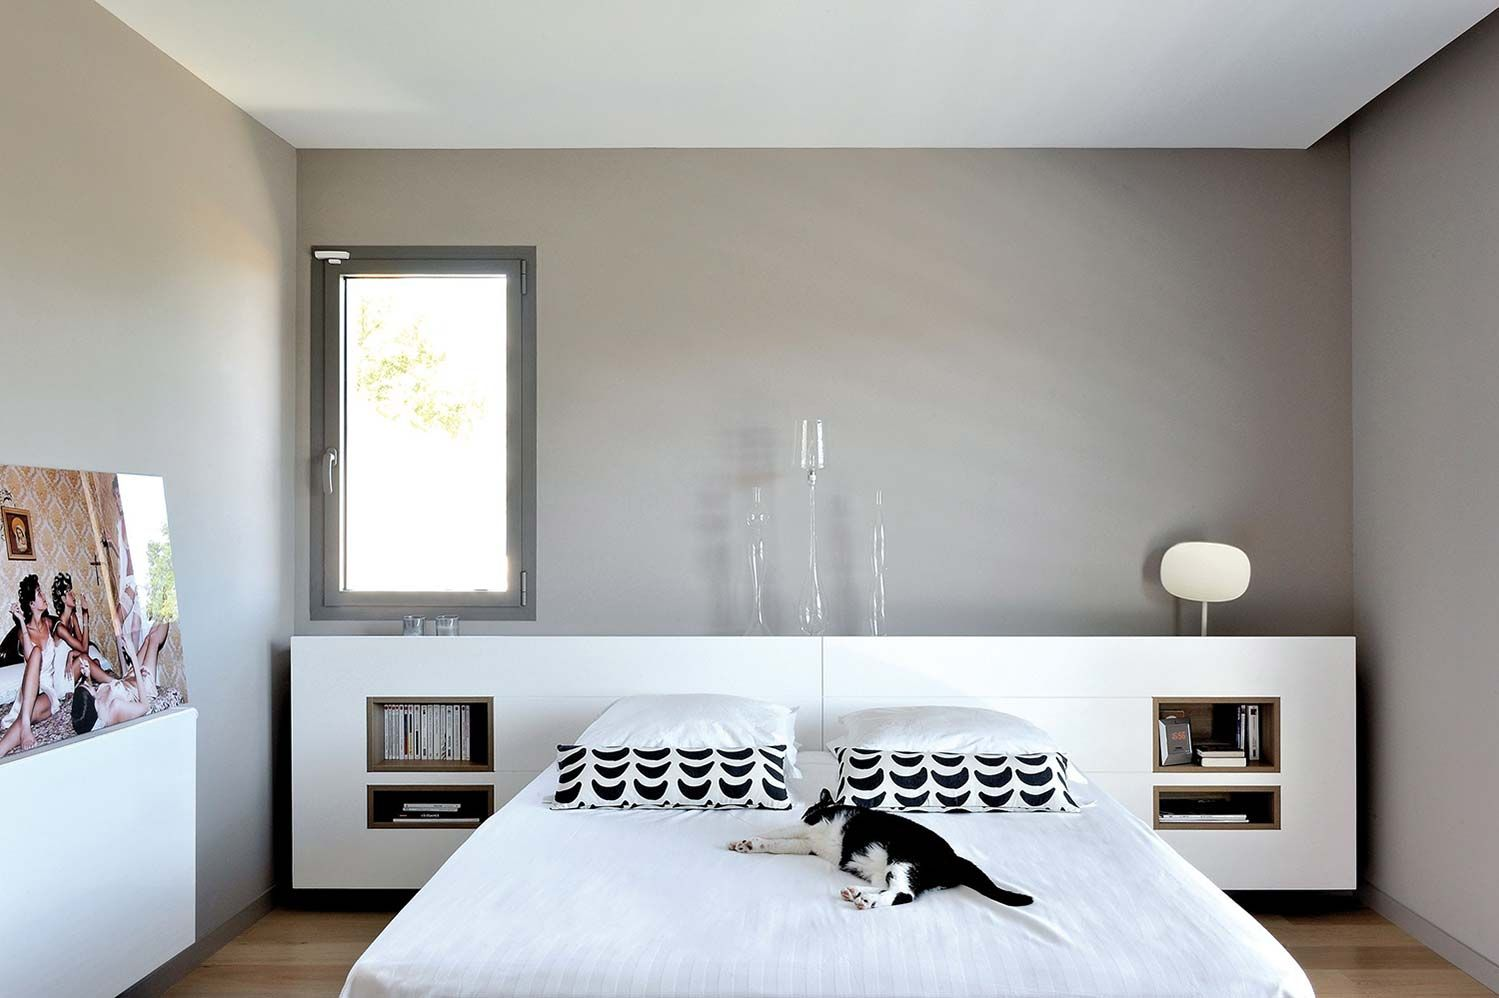 r ver partager vivre son projet chambres pinterest agencement interieur agence et. Black Bedroom Furniture Sets. Home Design Ideas